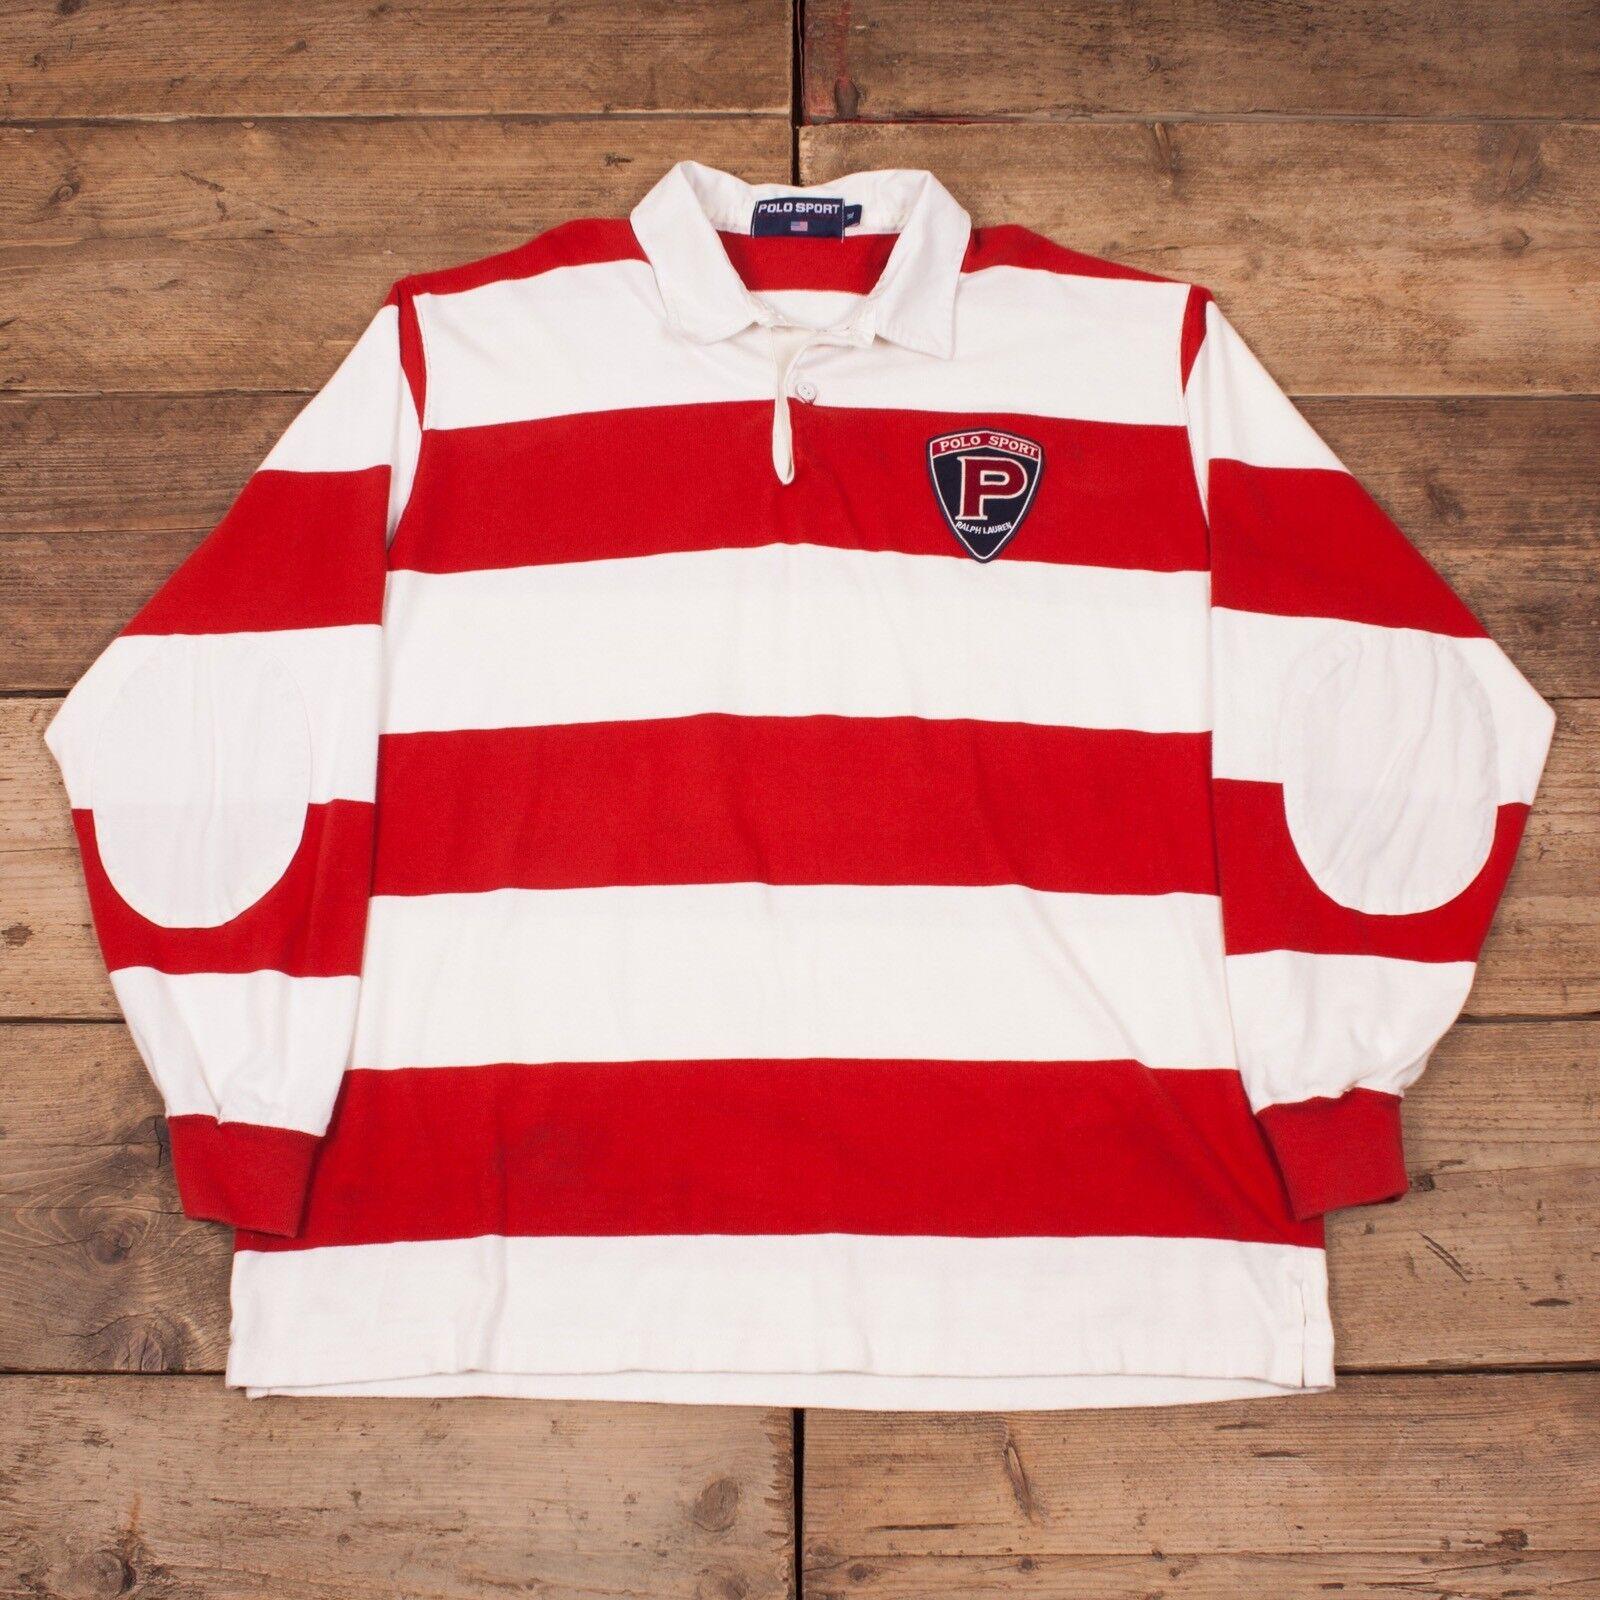 "Herren Vintage Polo Sport Ralph Lauren Rugby Jersey Sweatshirt Jumper XL 48"" R8846"